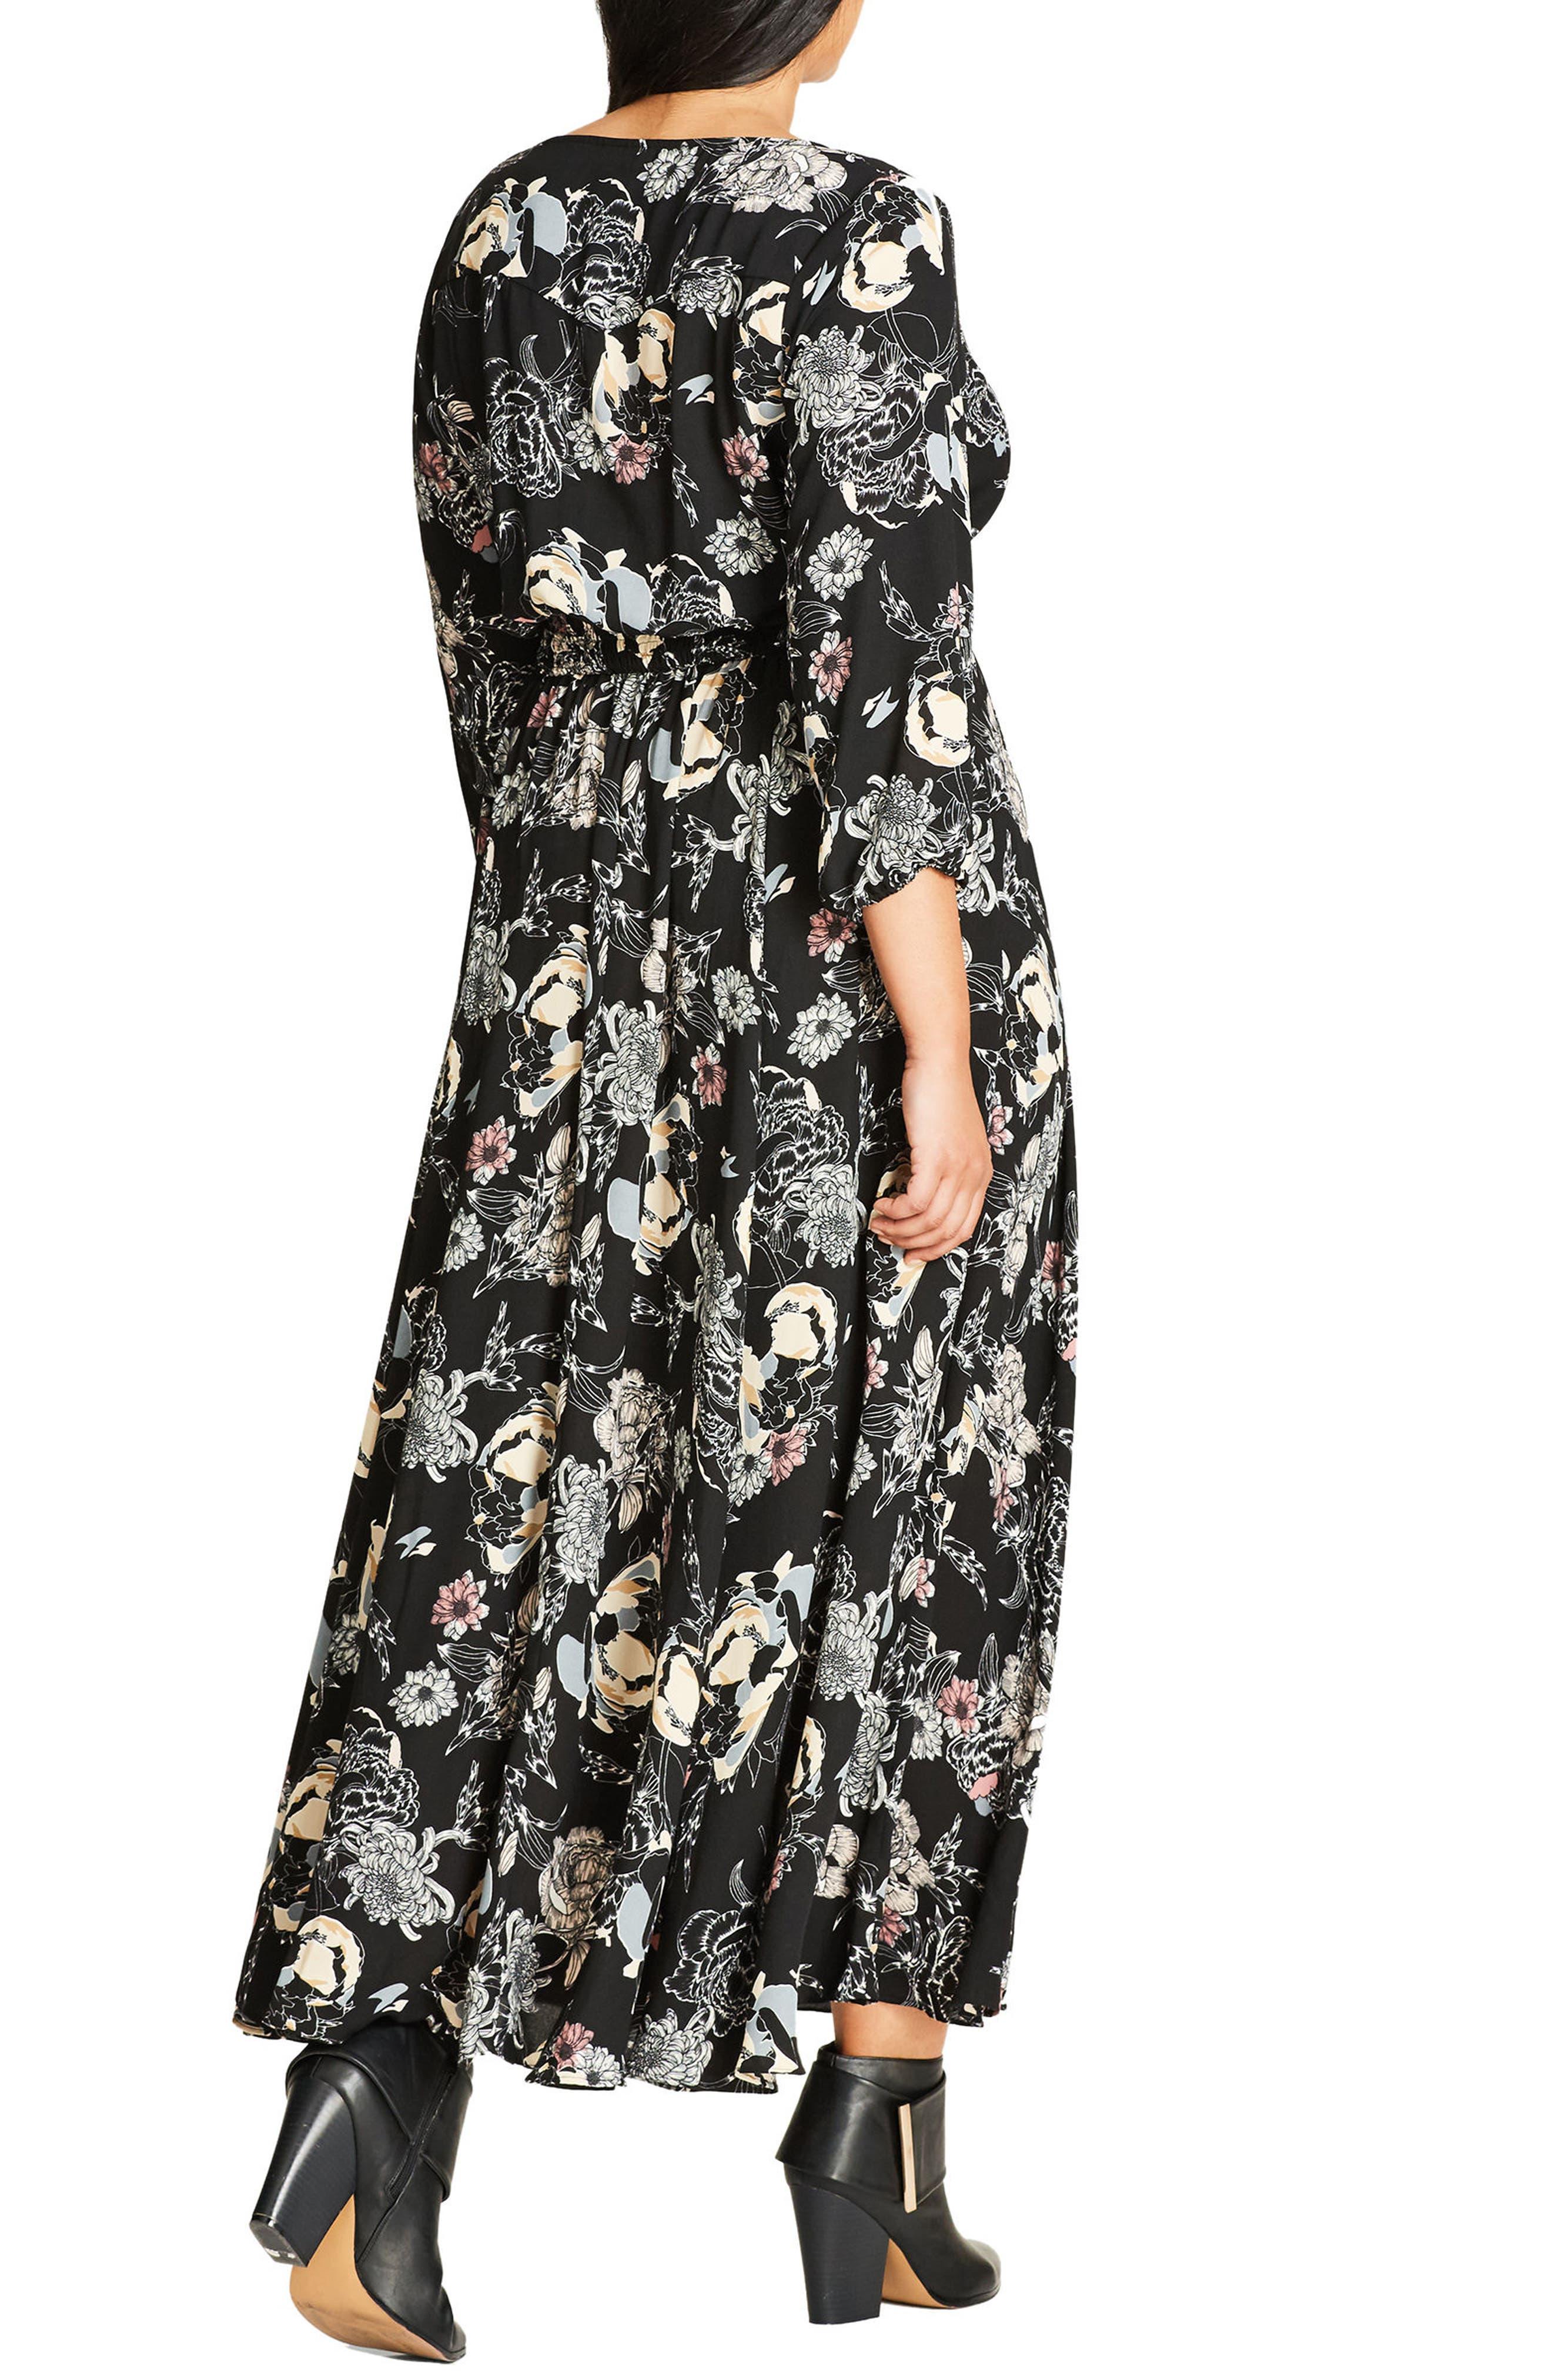 CITY CHIC,                             Floral Maxi Dress,                             Alternate thumbnail 2, color,                             001